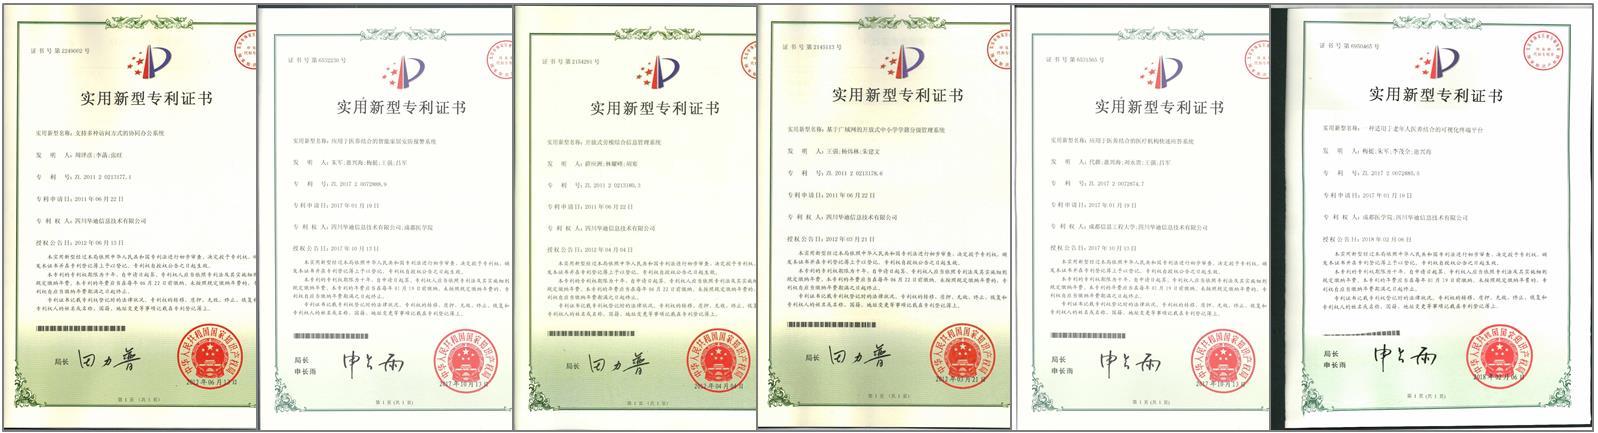 http://www.yundeeonline.com/documents/340939/347035/20180712101604748SWAMIZLV.jpg